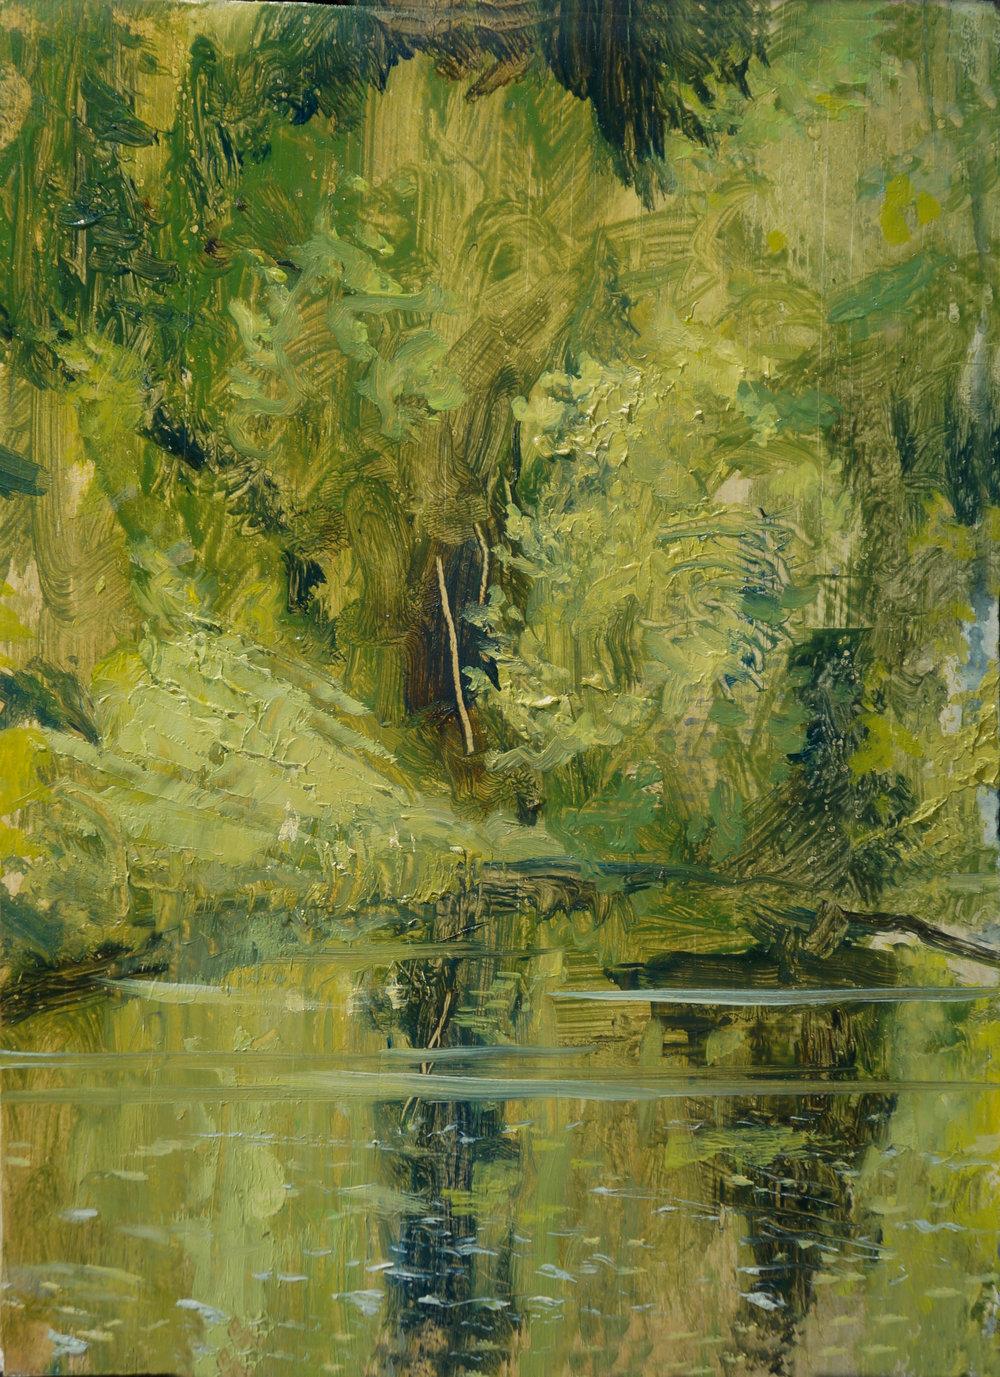 RHSK012 Lake Matsubarako Late Summer 2017  ( oil on panel ) 20.5 x 16